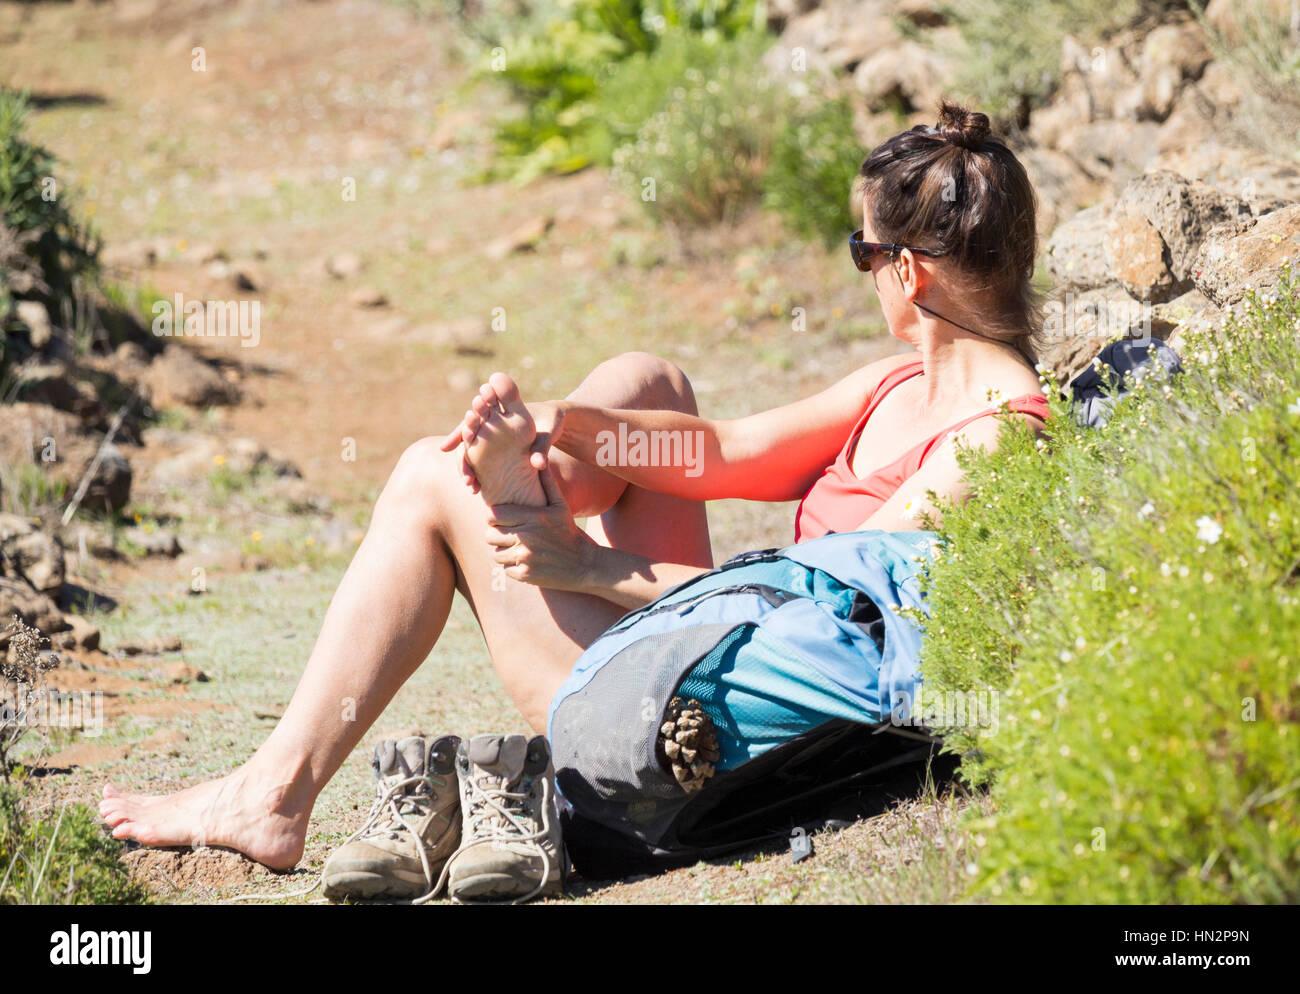 Foot massage, female hiker massaging her feet on mountain footpath. Stock Photo